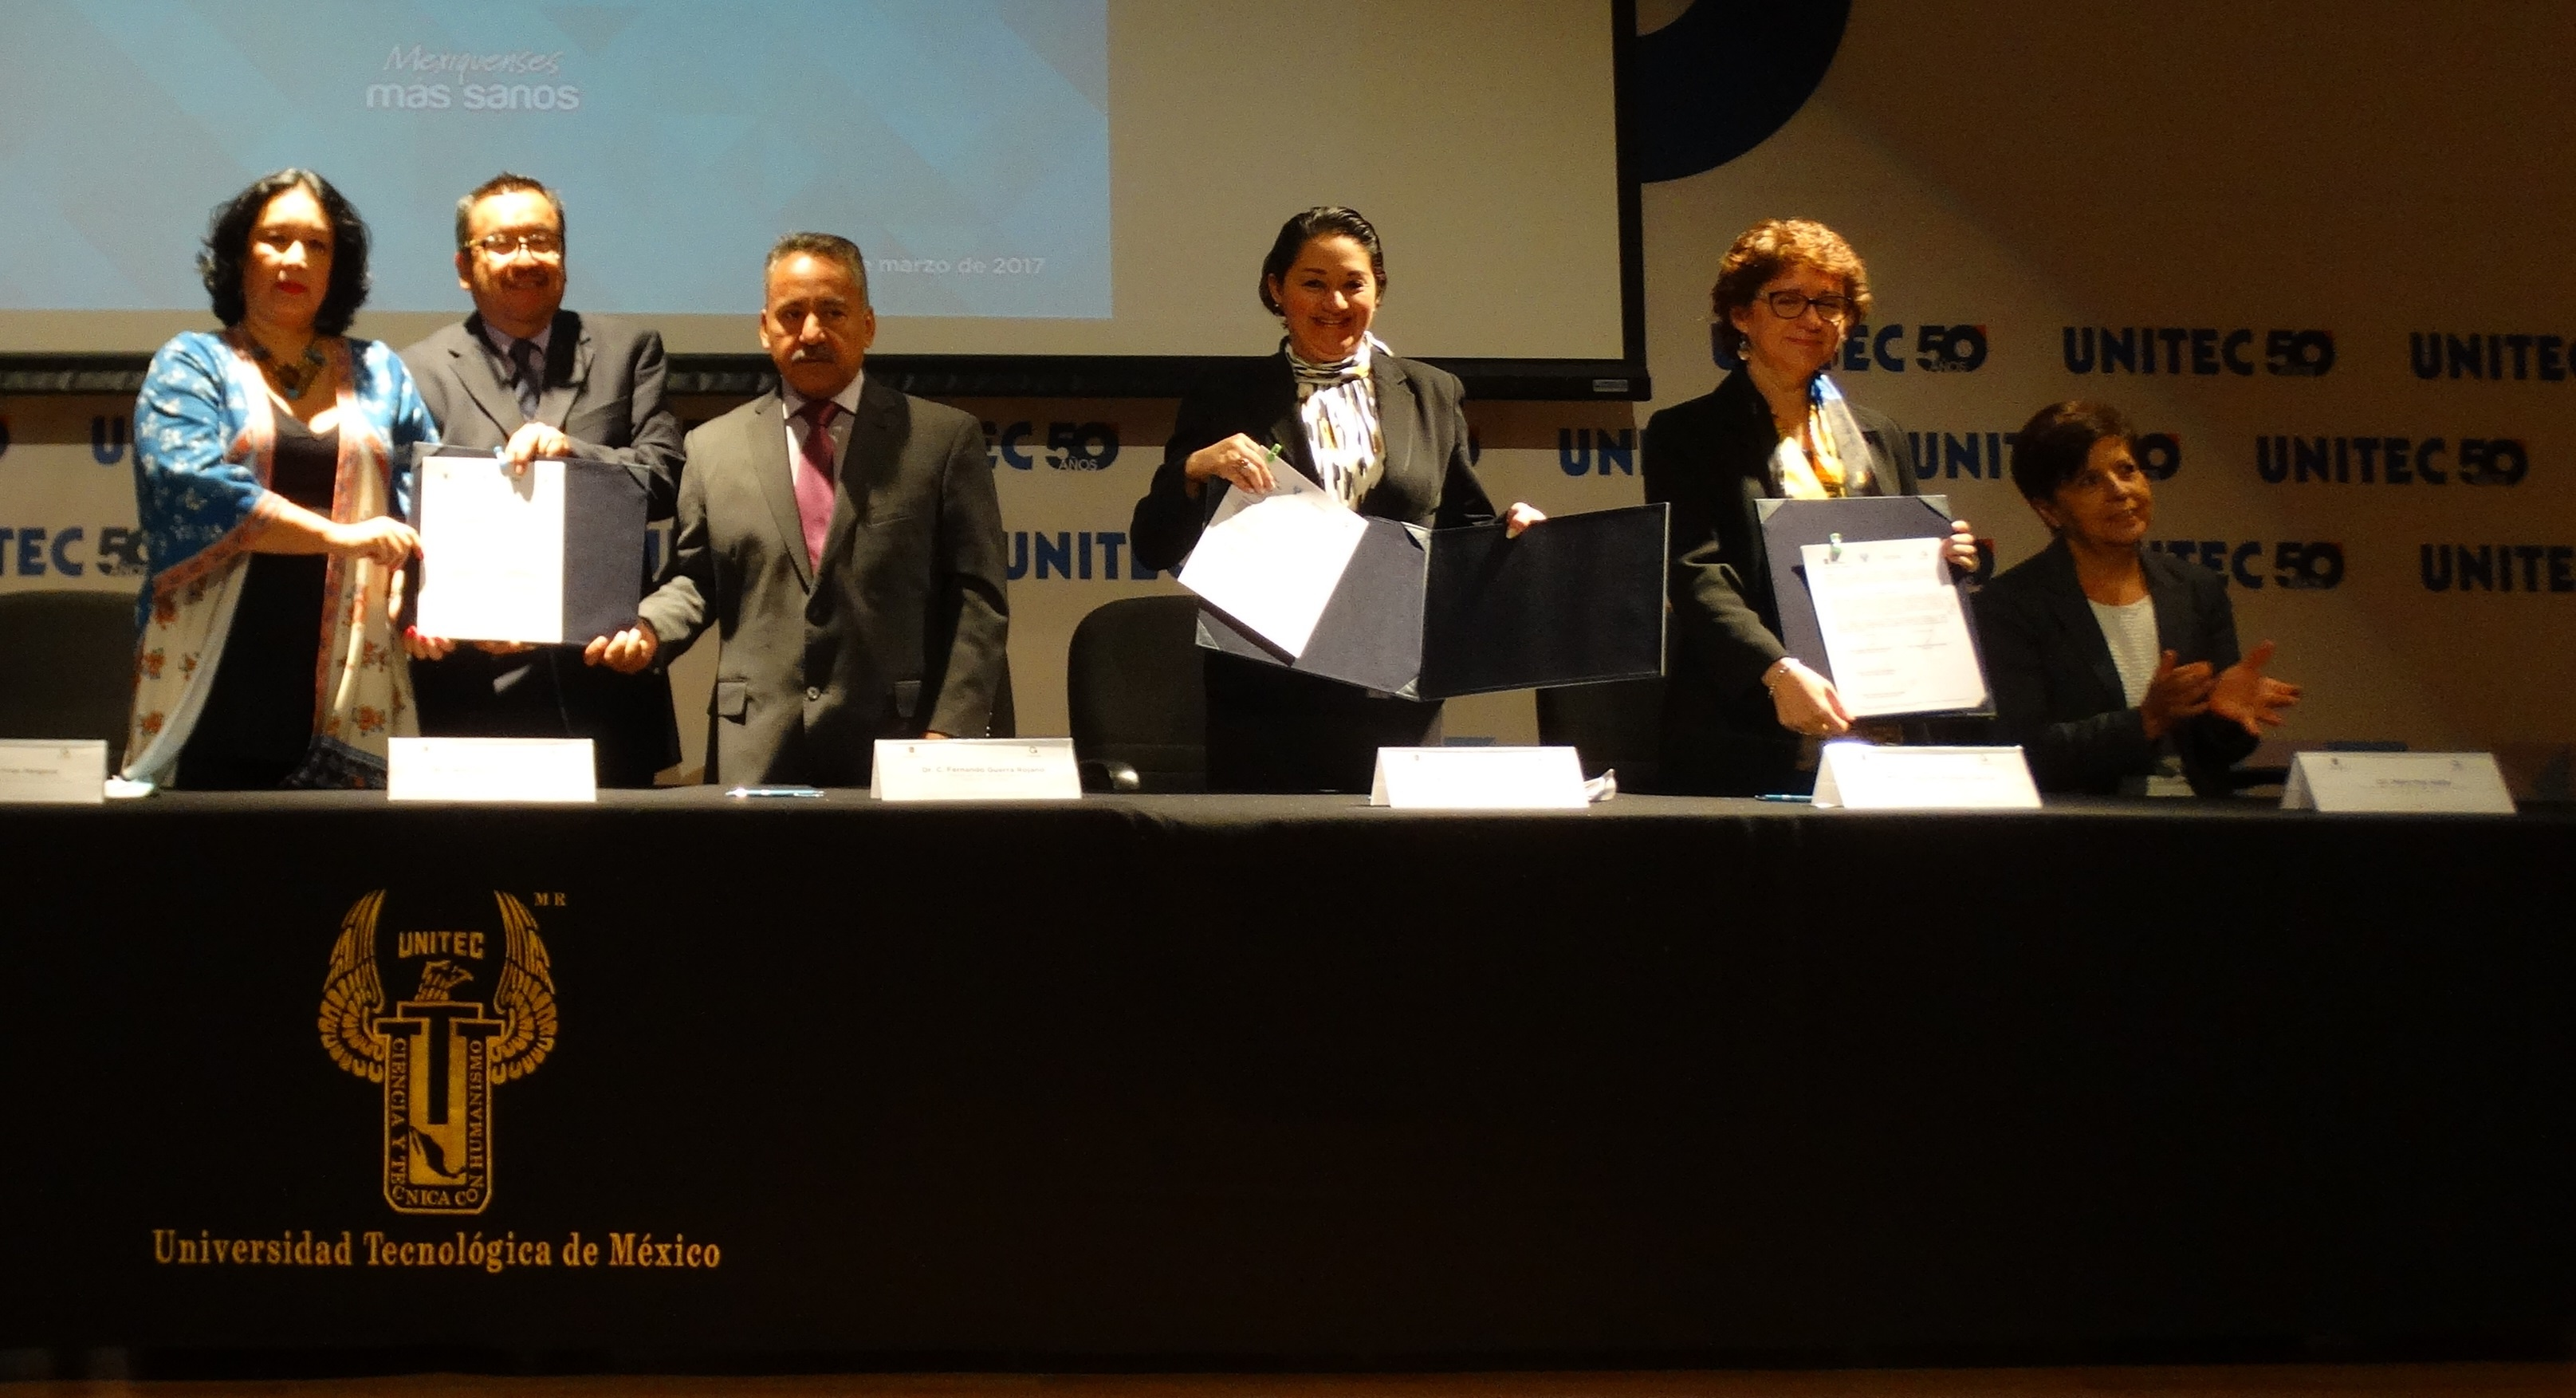 UNITEC firma convenio con el Instituto Mexiquense contra las Adicciones - Featured Image